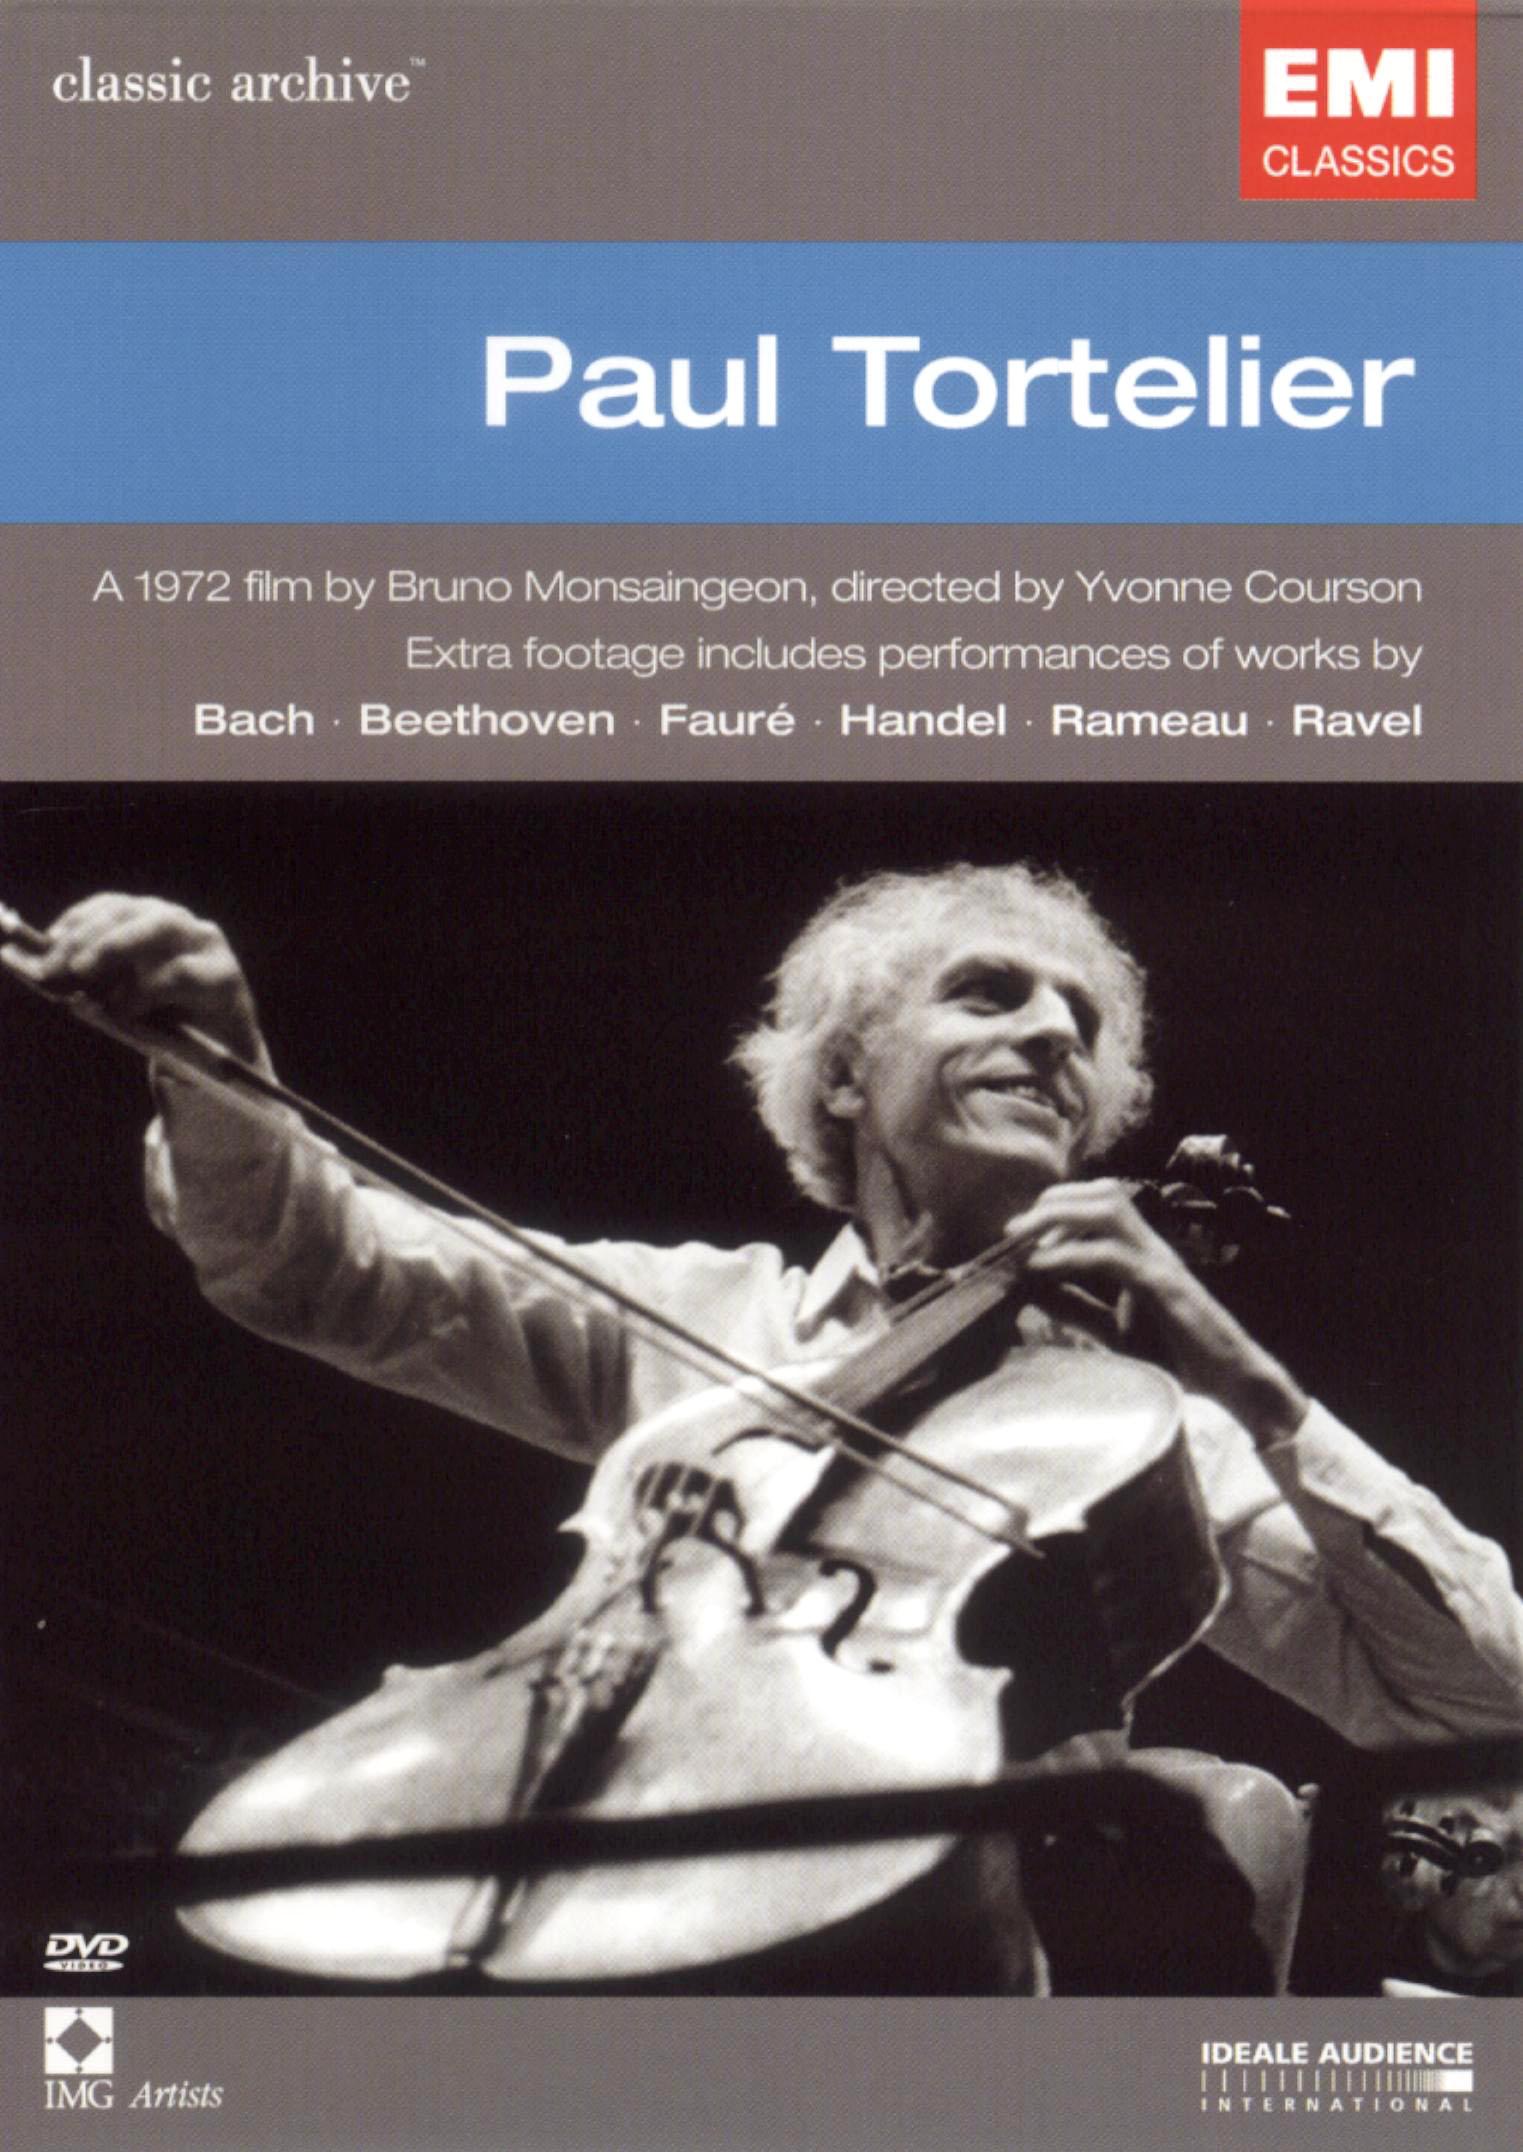 Classic Archive: Paul Tortelier